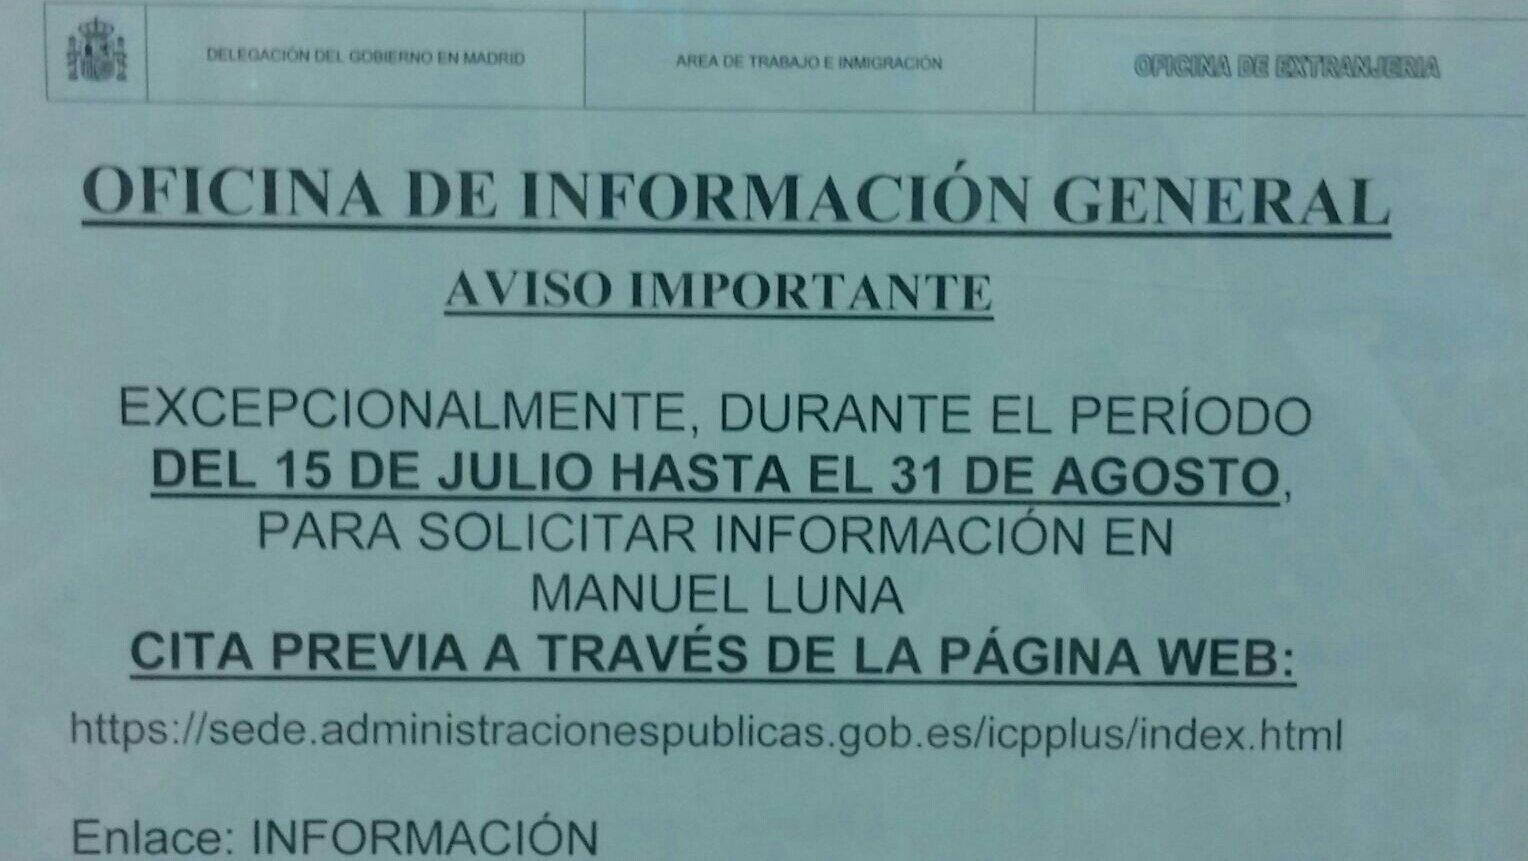 Aviso importante cita previa informaci n extranjer a for Oficina de extranjeria aluche